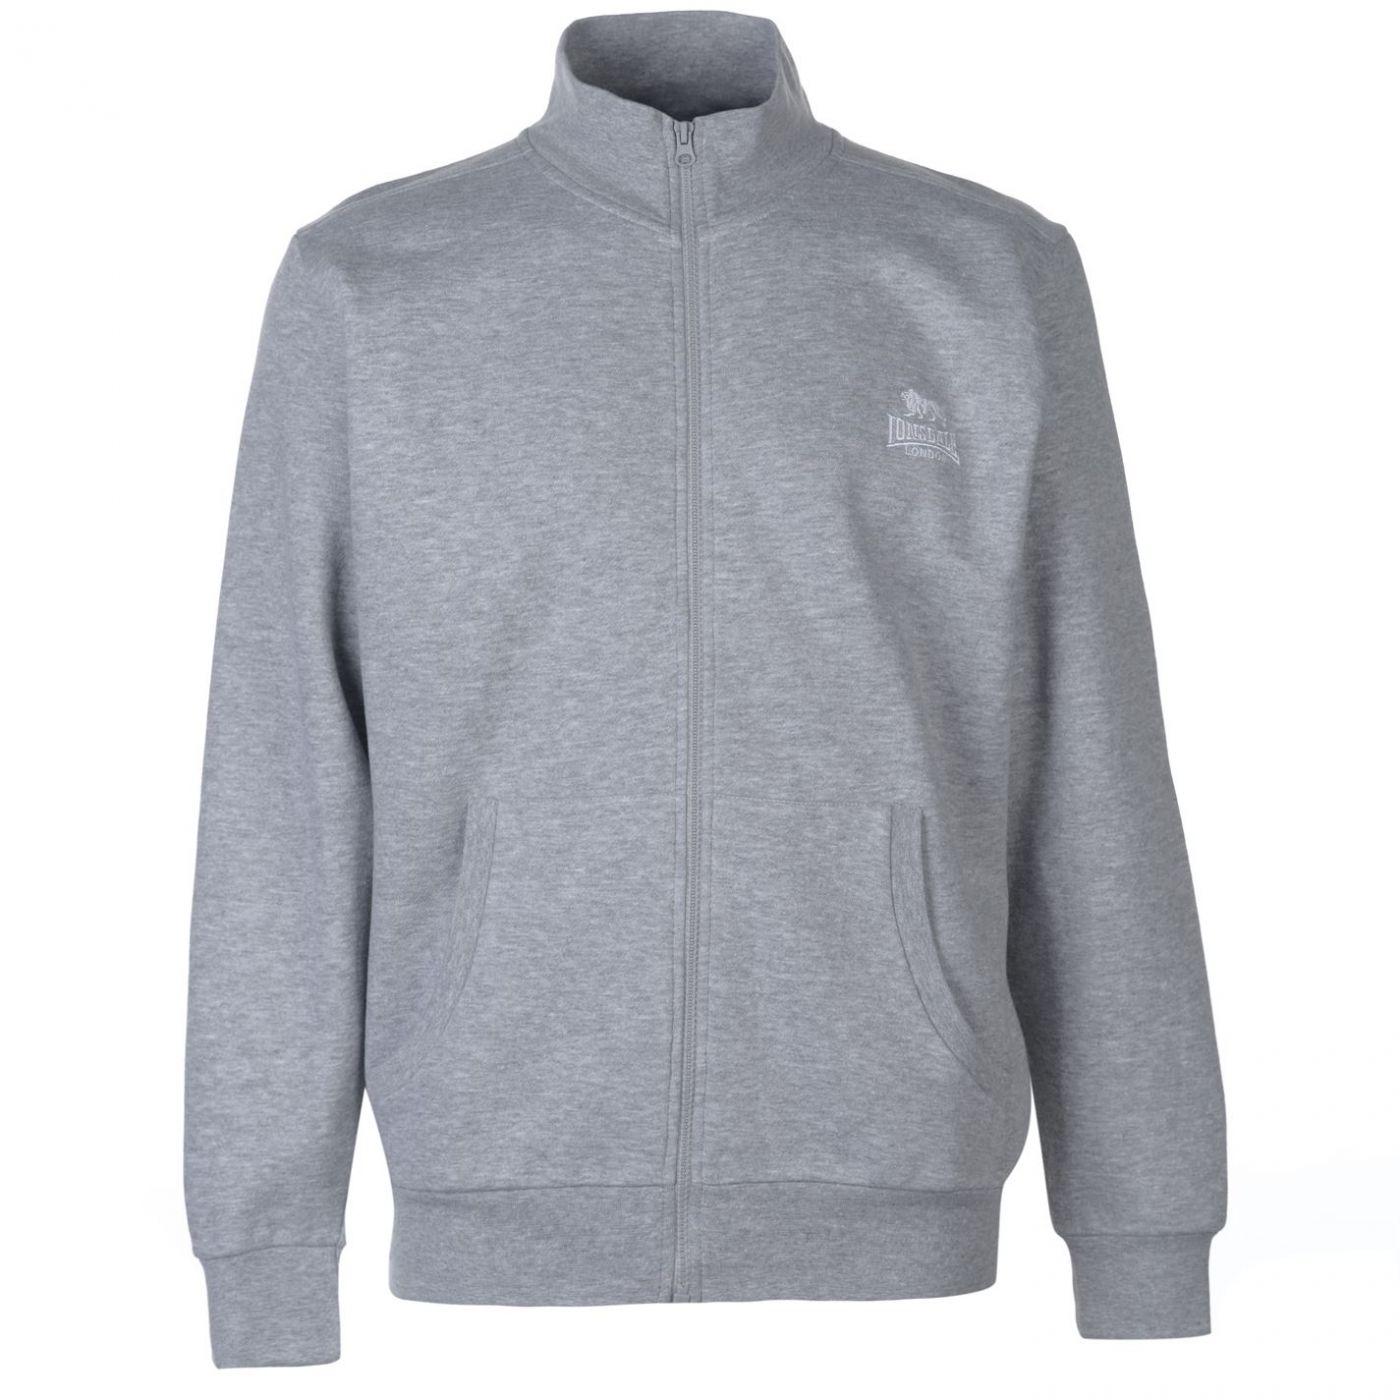 Lonsdale Full Zip Fleece Mens